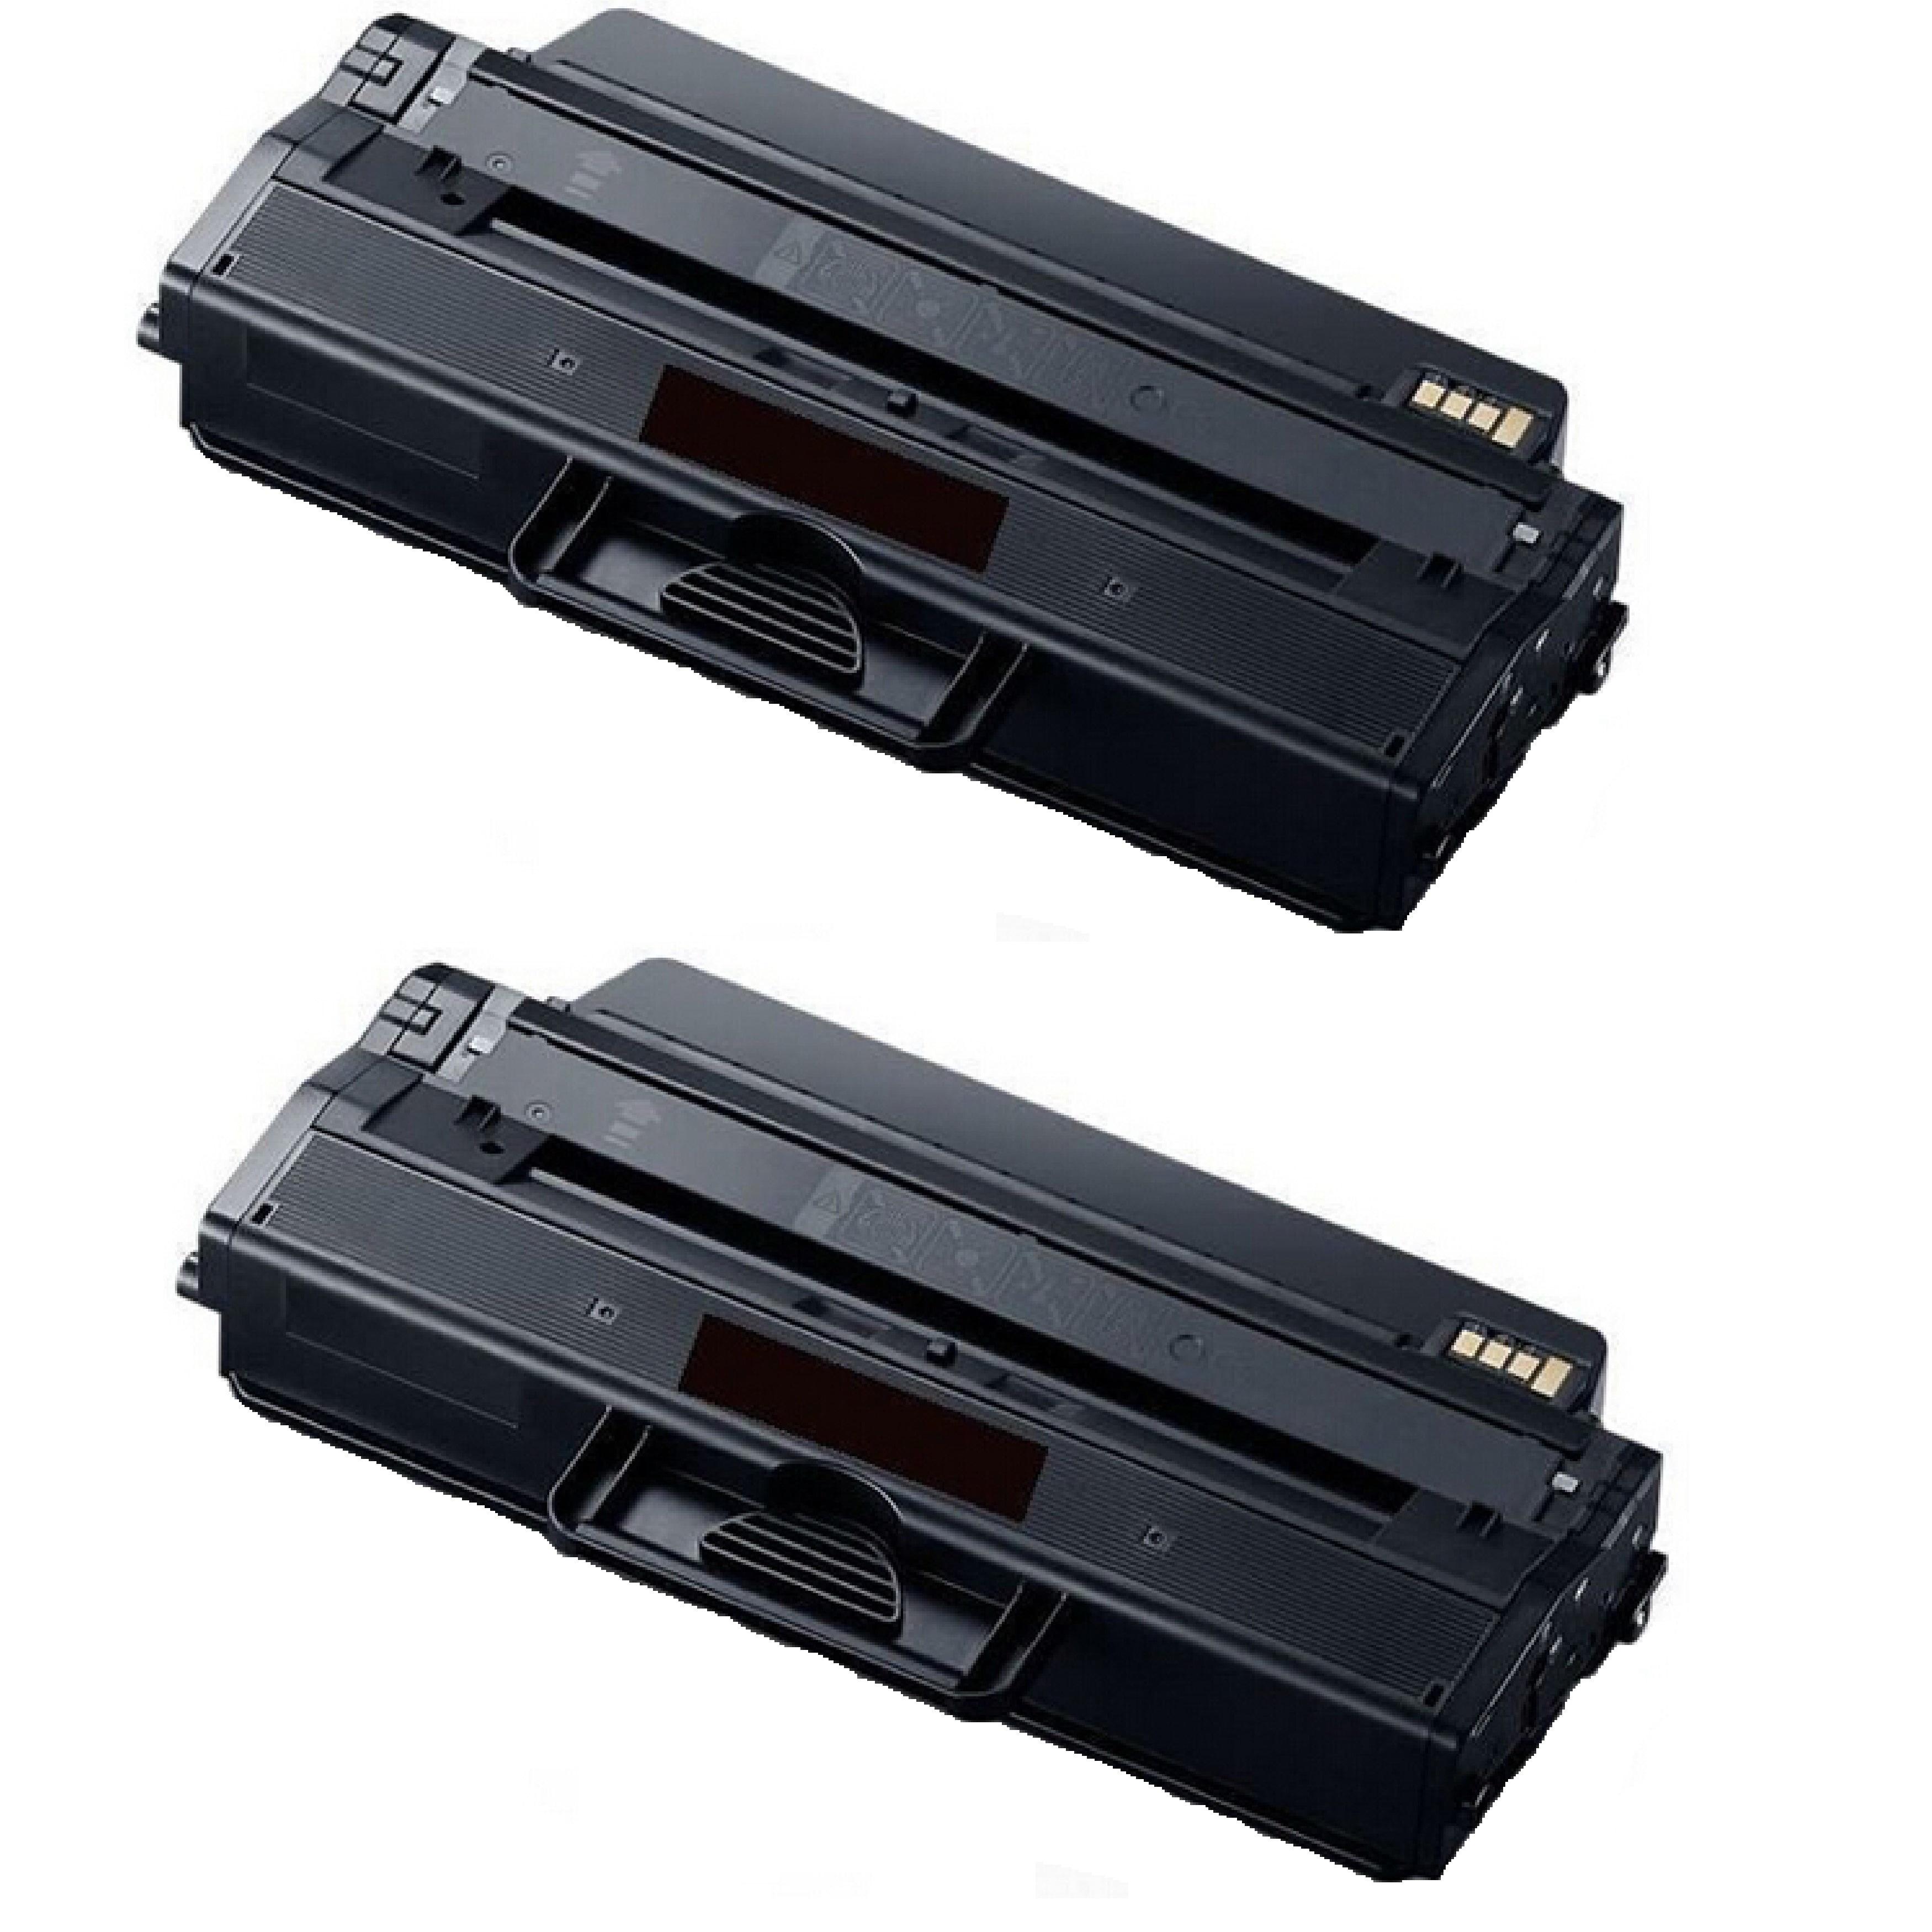 Prinko High Yield Toner Cartridge for Samsung 115L SL-M28...